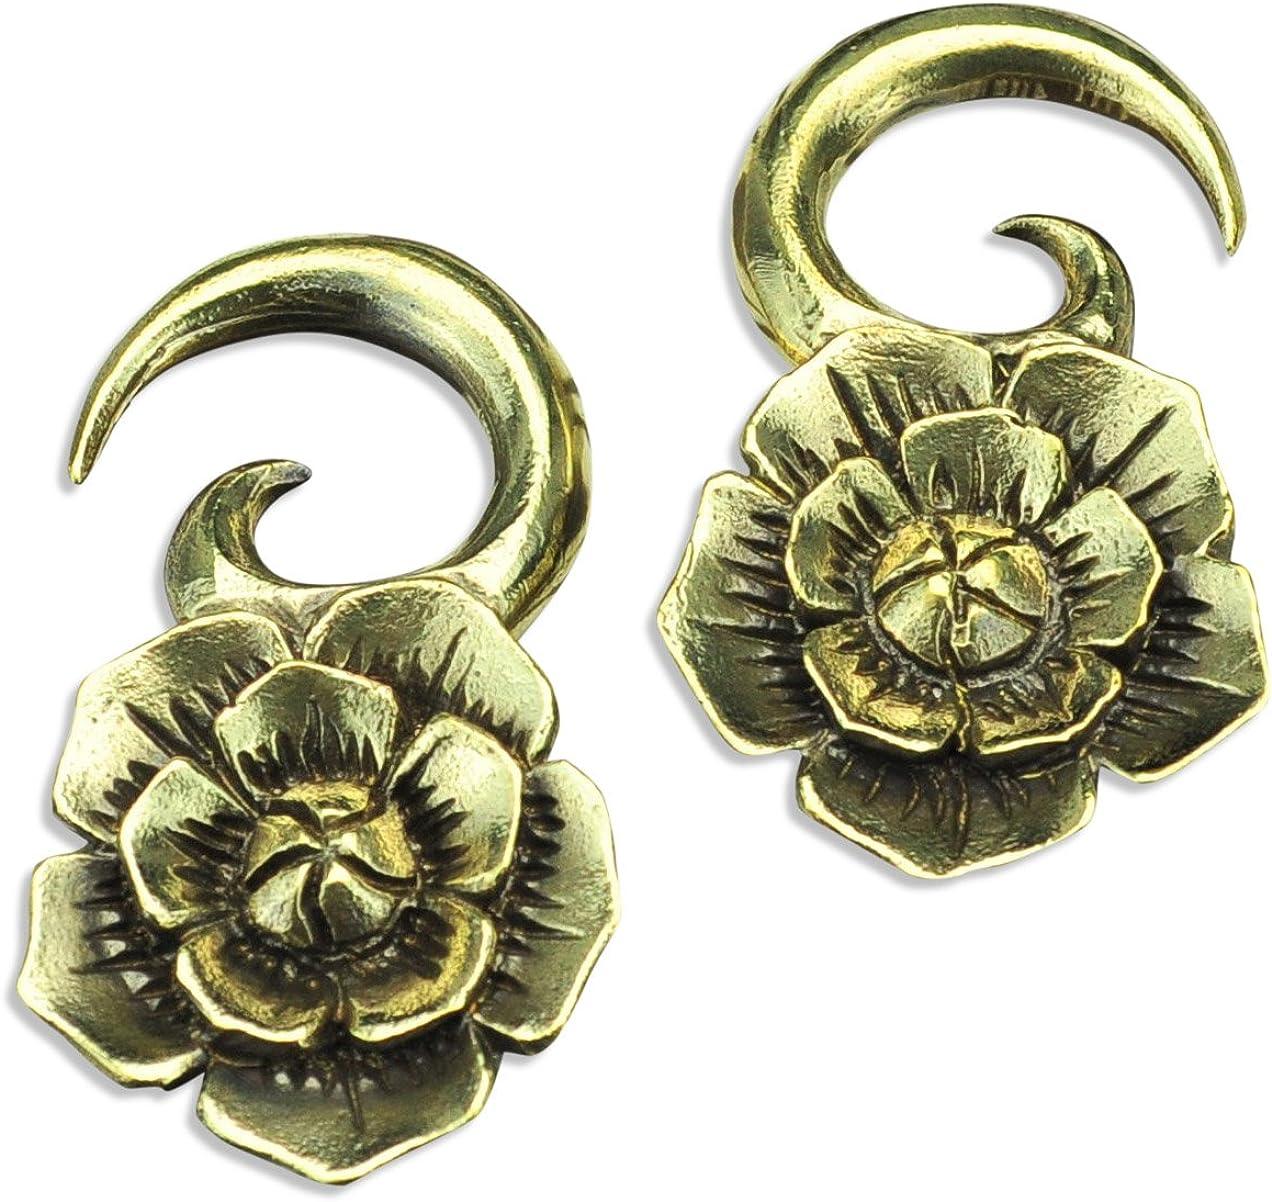 White Brass Flower Ear Weights Hangers Gauges